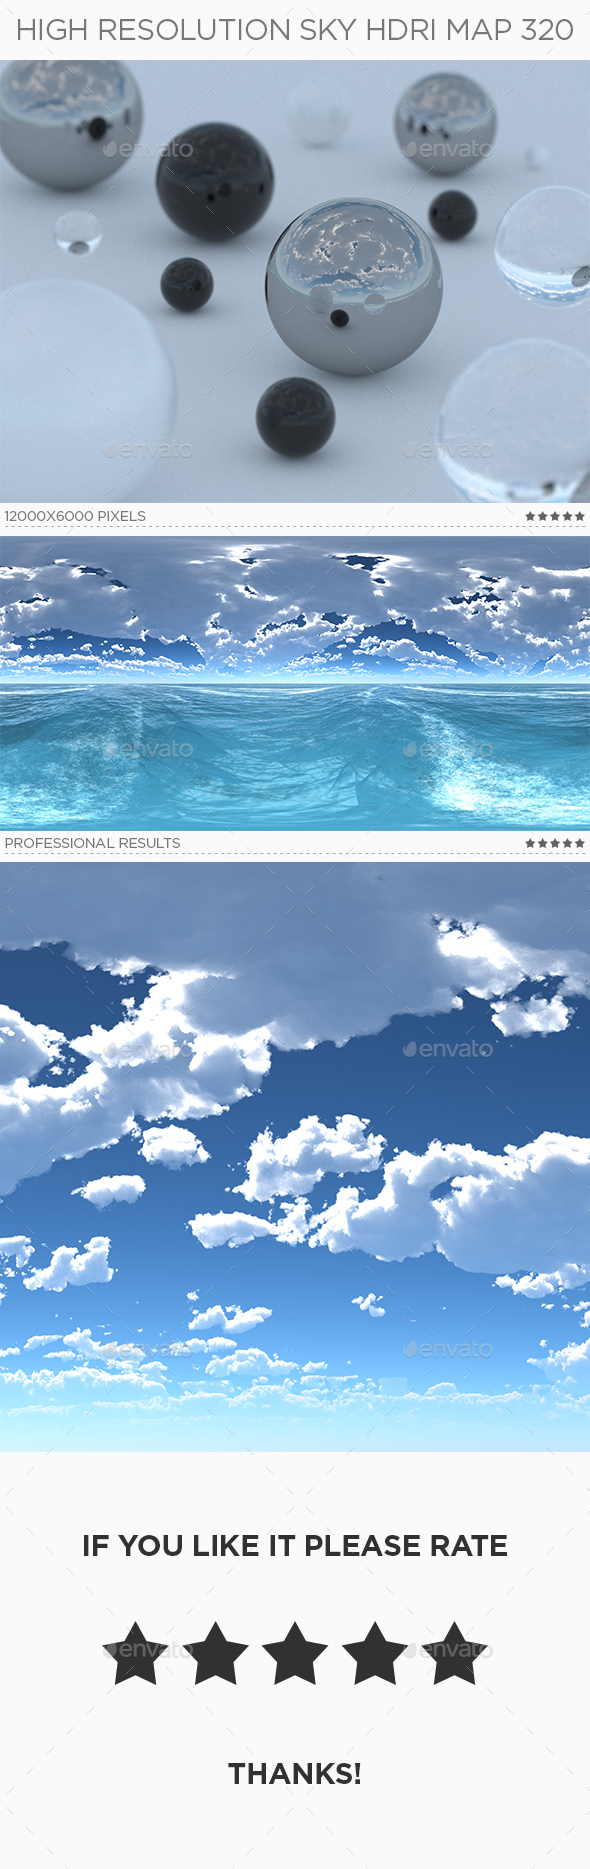 High Resolution Sky HDRi Map 320 - 3DOcean Item for Sale